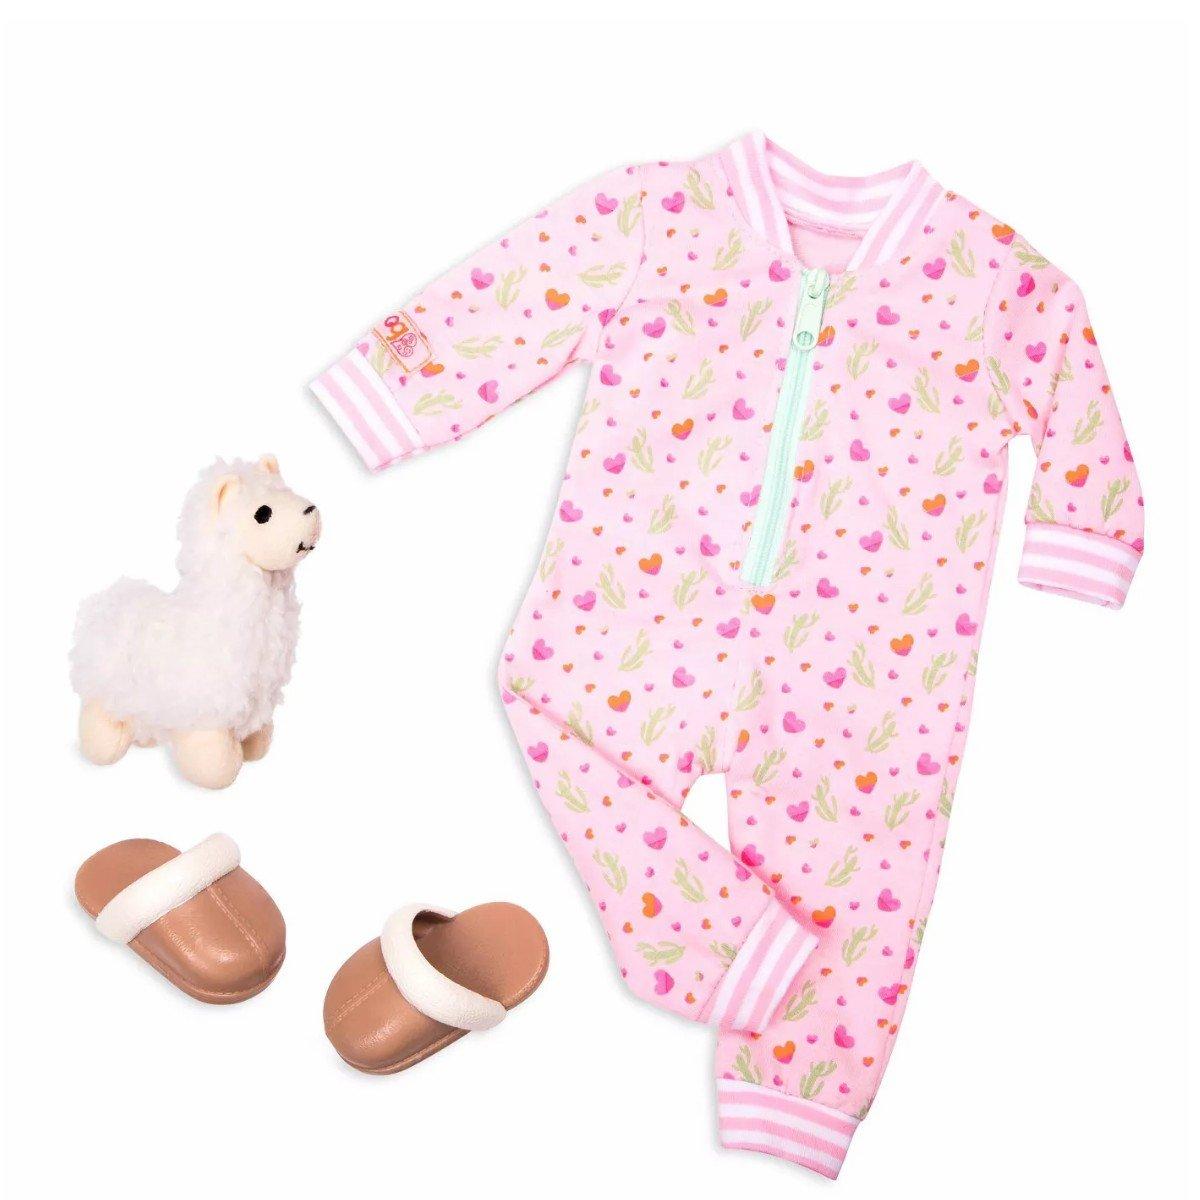 Our Generation - Kleidung - Schlafanzug Lamas